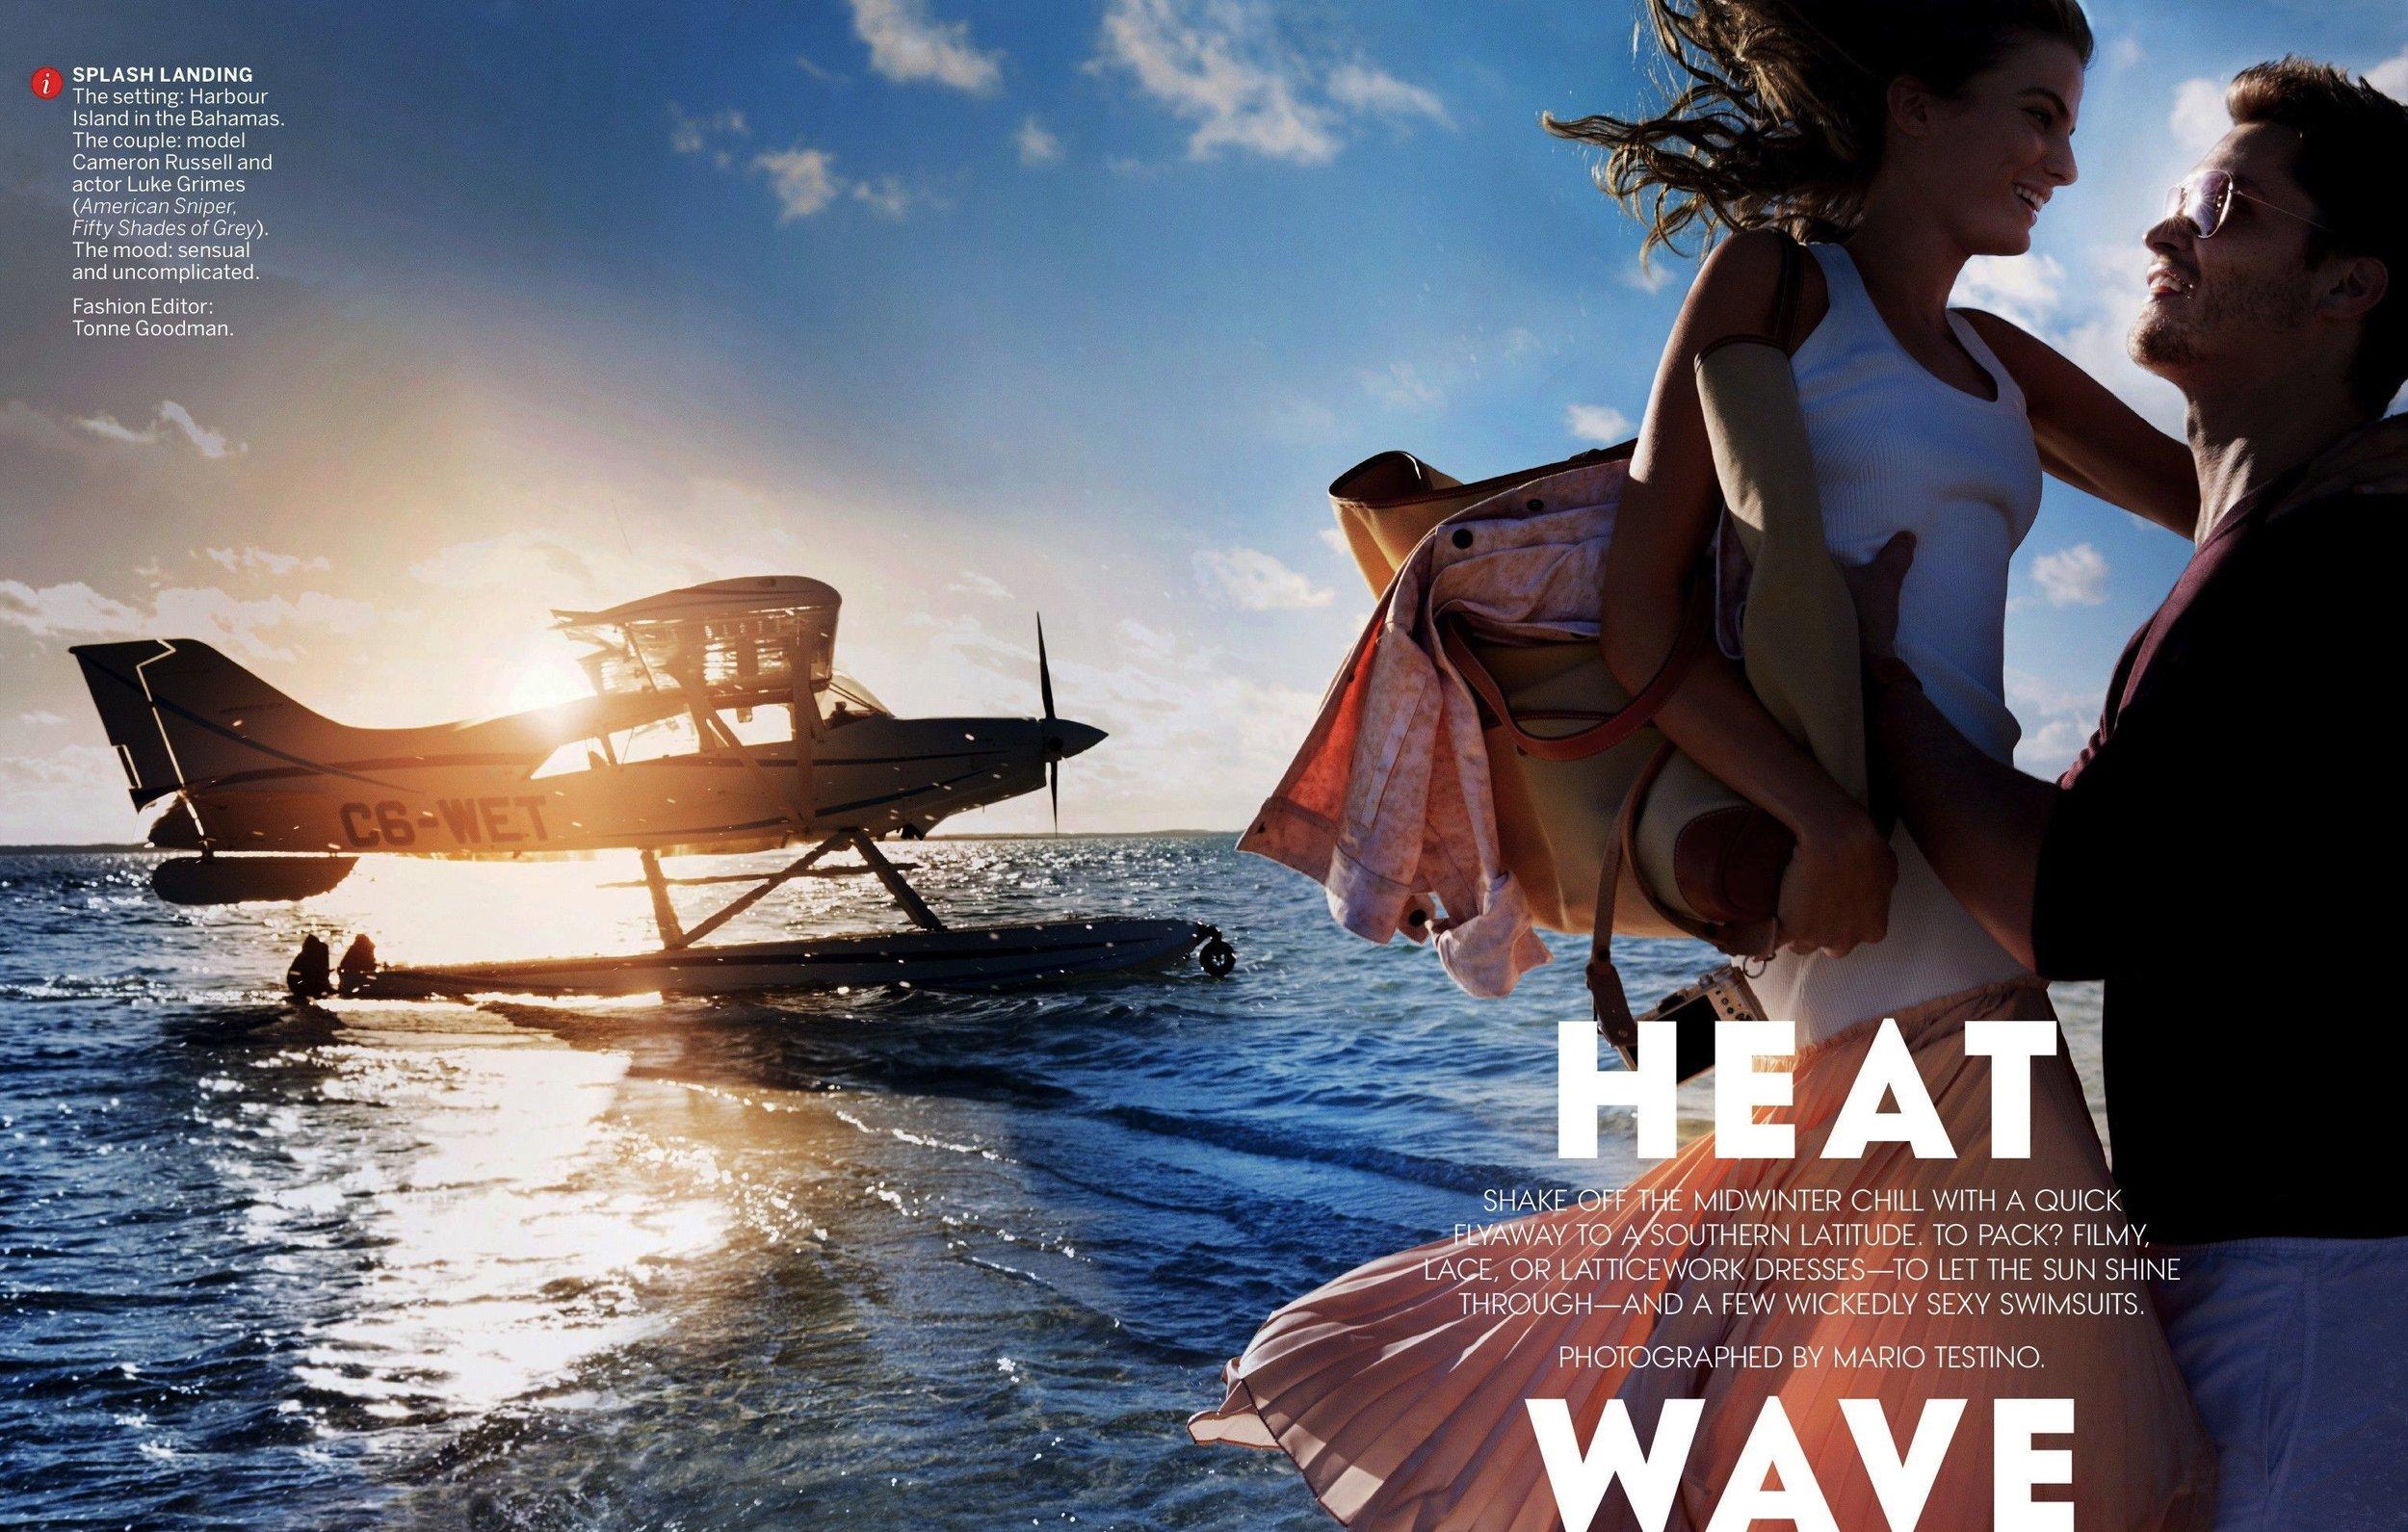 harbour-island-india-hicks-vogue-2015-habituallychic-002.jpg